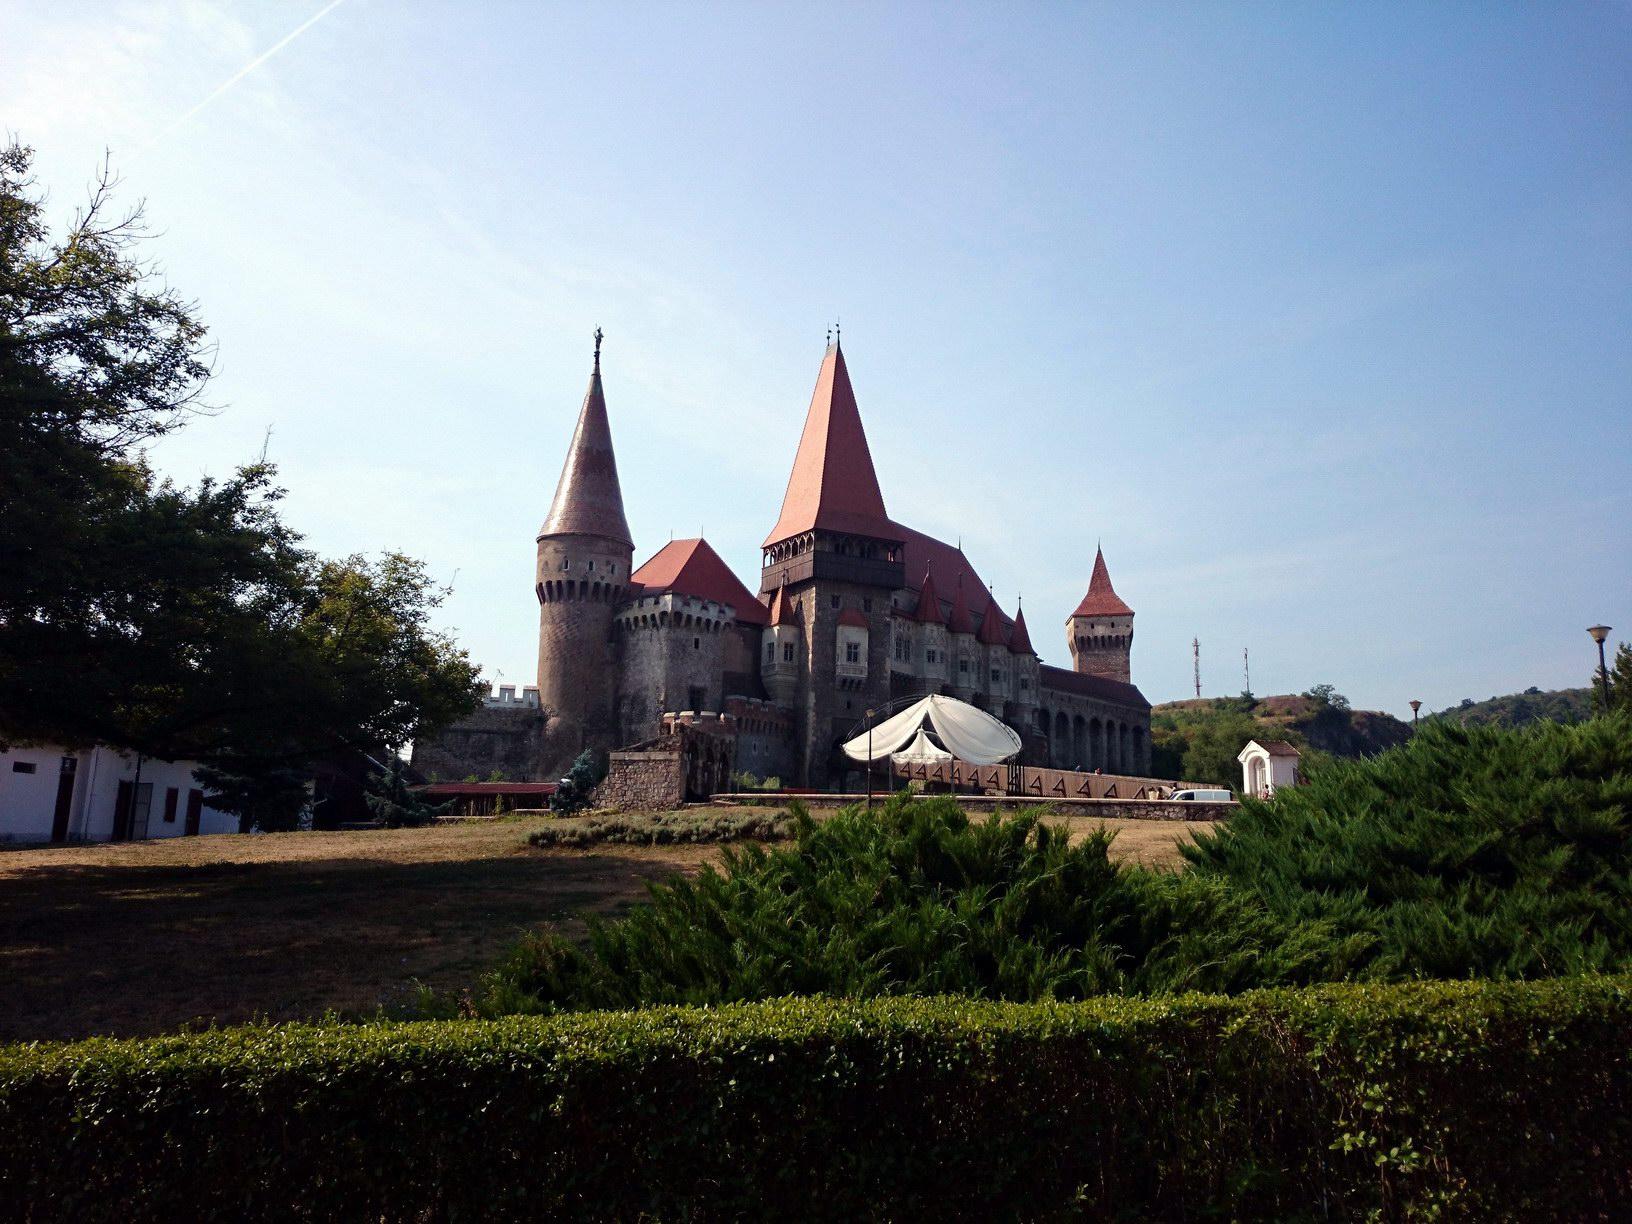 Travelling: Turda, Alba Iulia, Hunedoara, Sarmizegetusa, Transalpina, Sighisoara